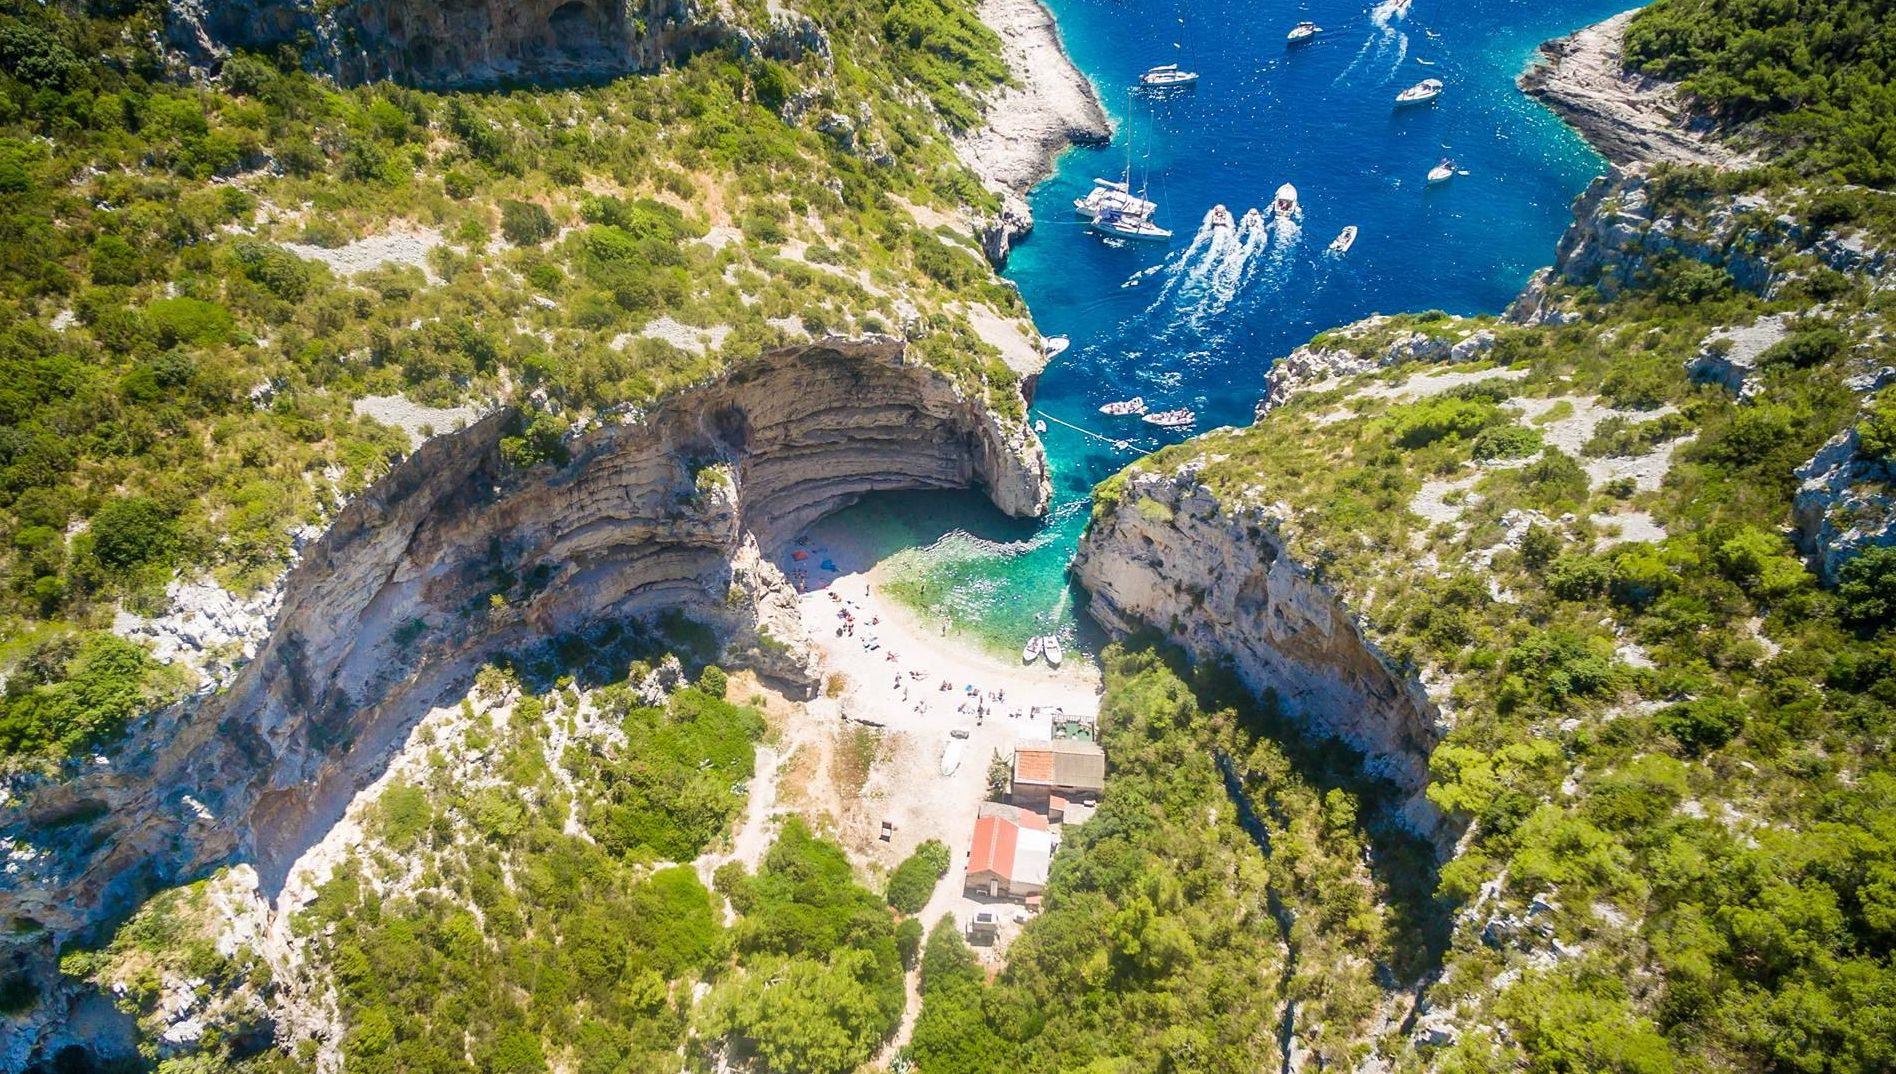 [VIDEO] Breathtaking Footage of the Croatian Coast